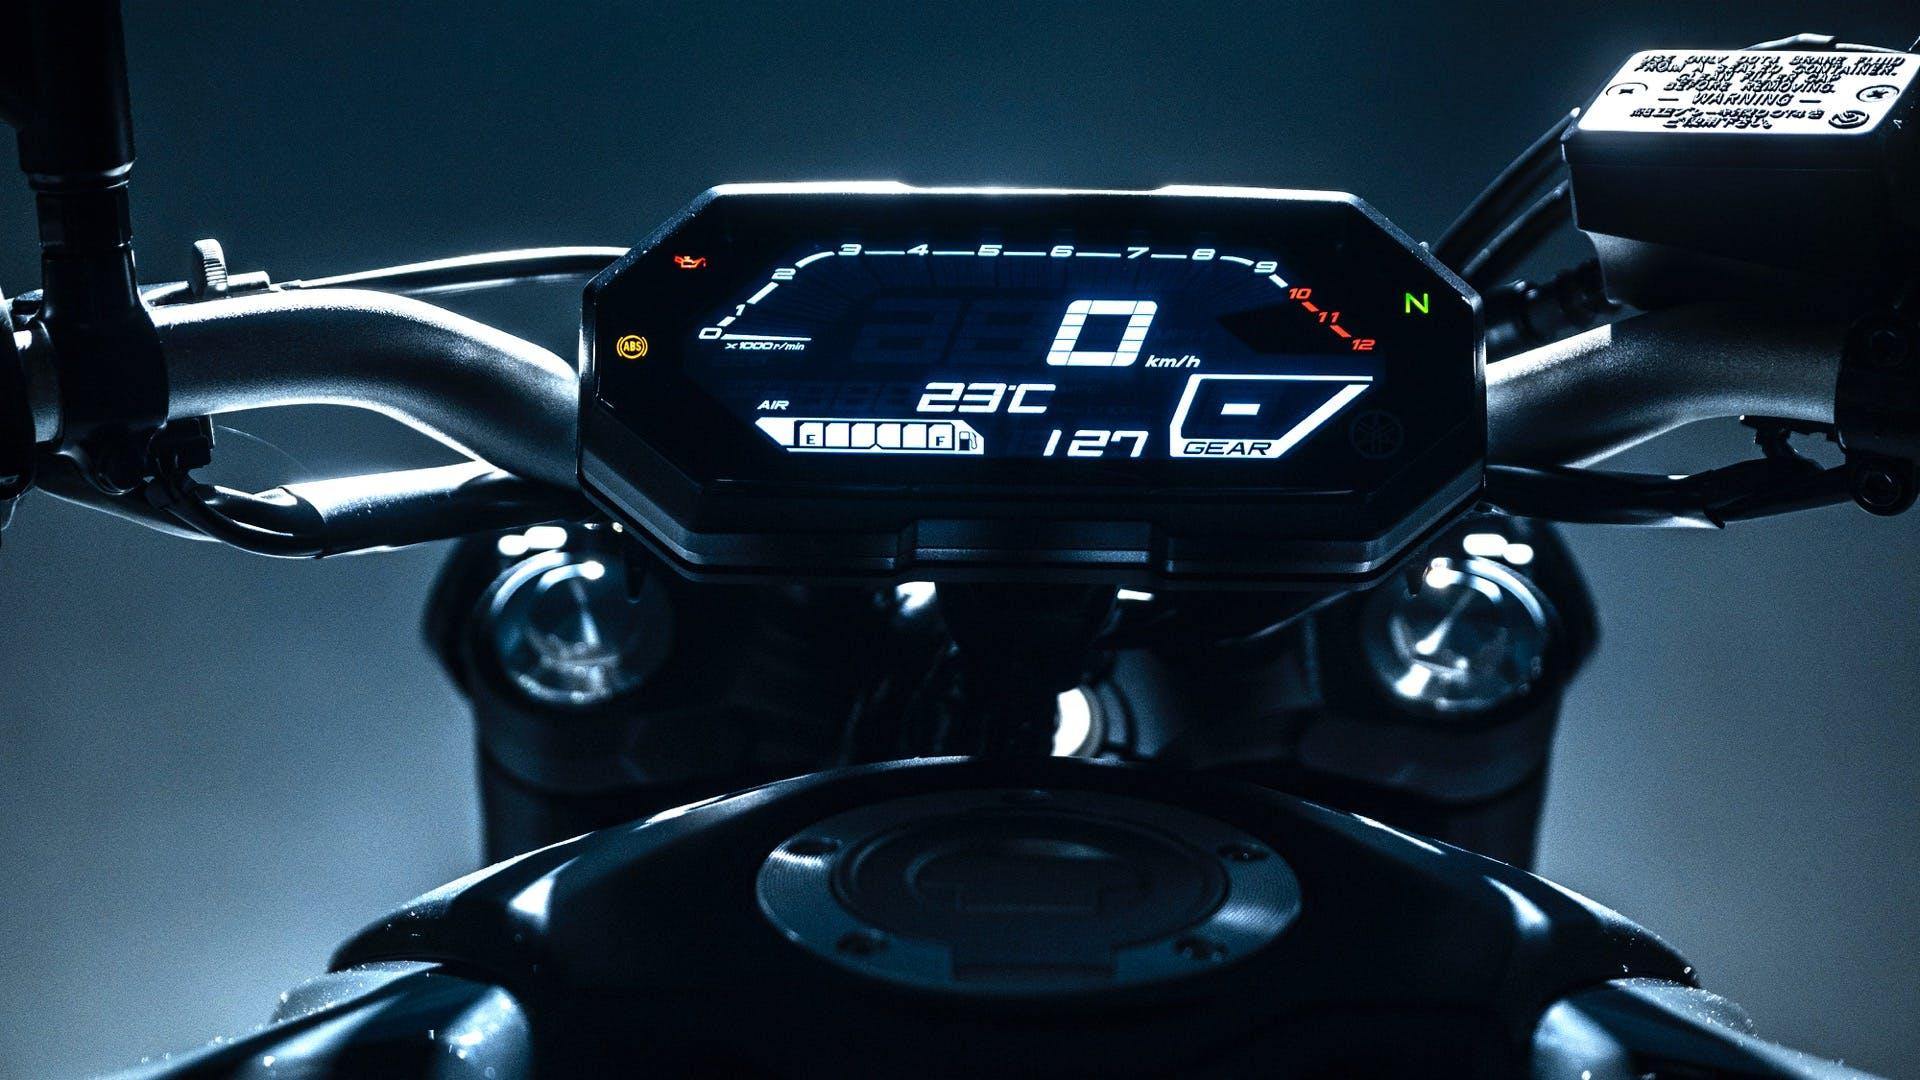 Yamaha MT-07 2021 Cruscotto